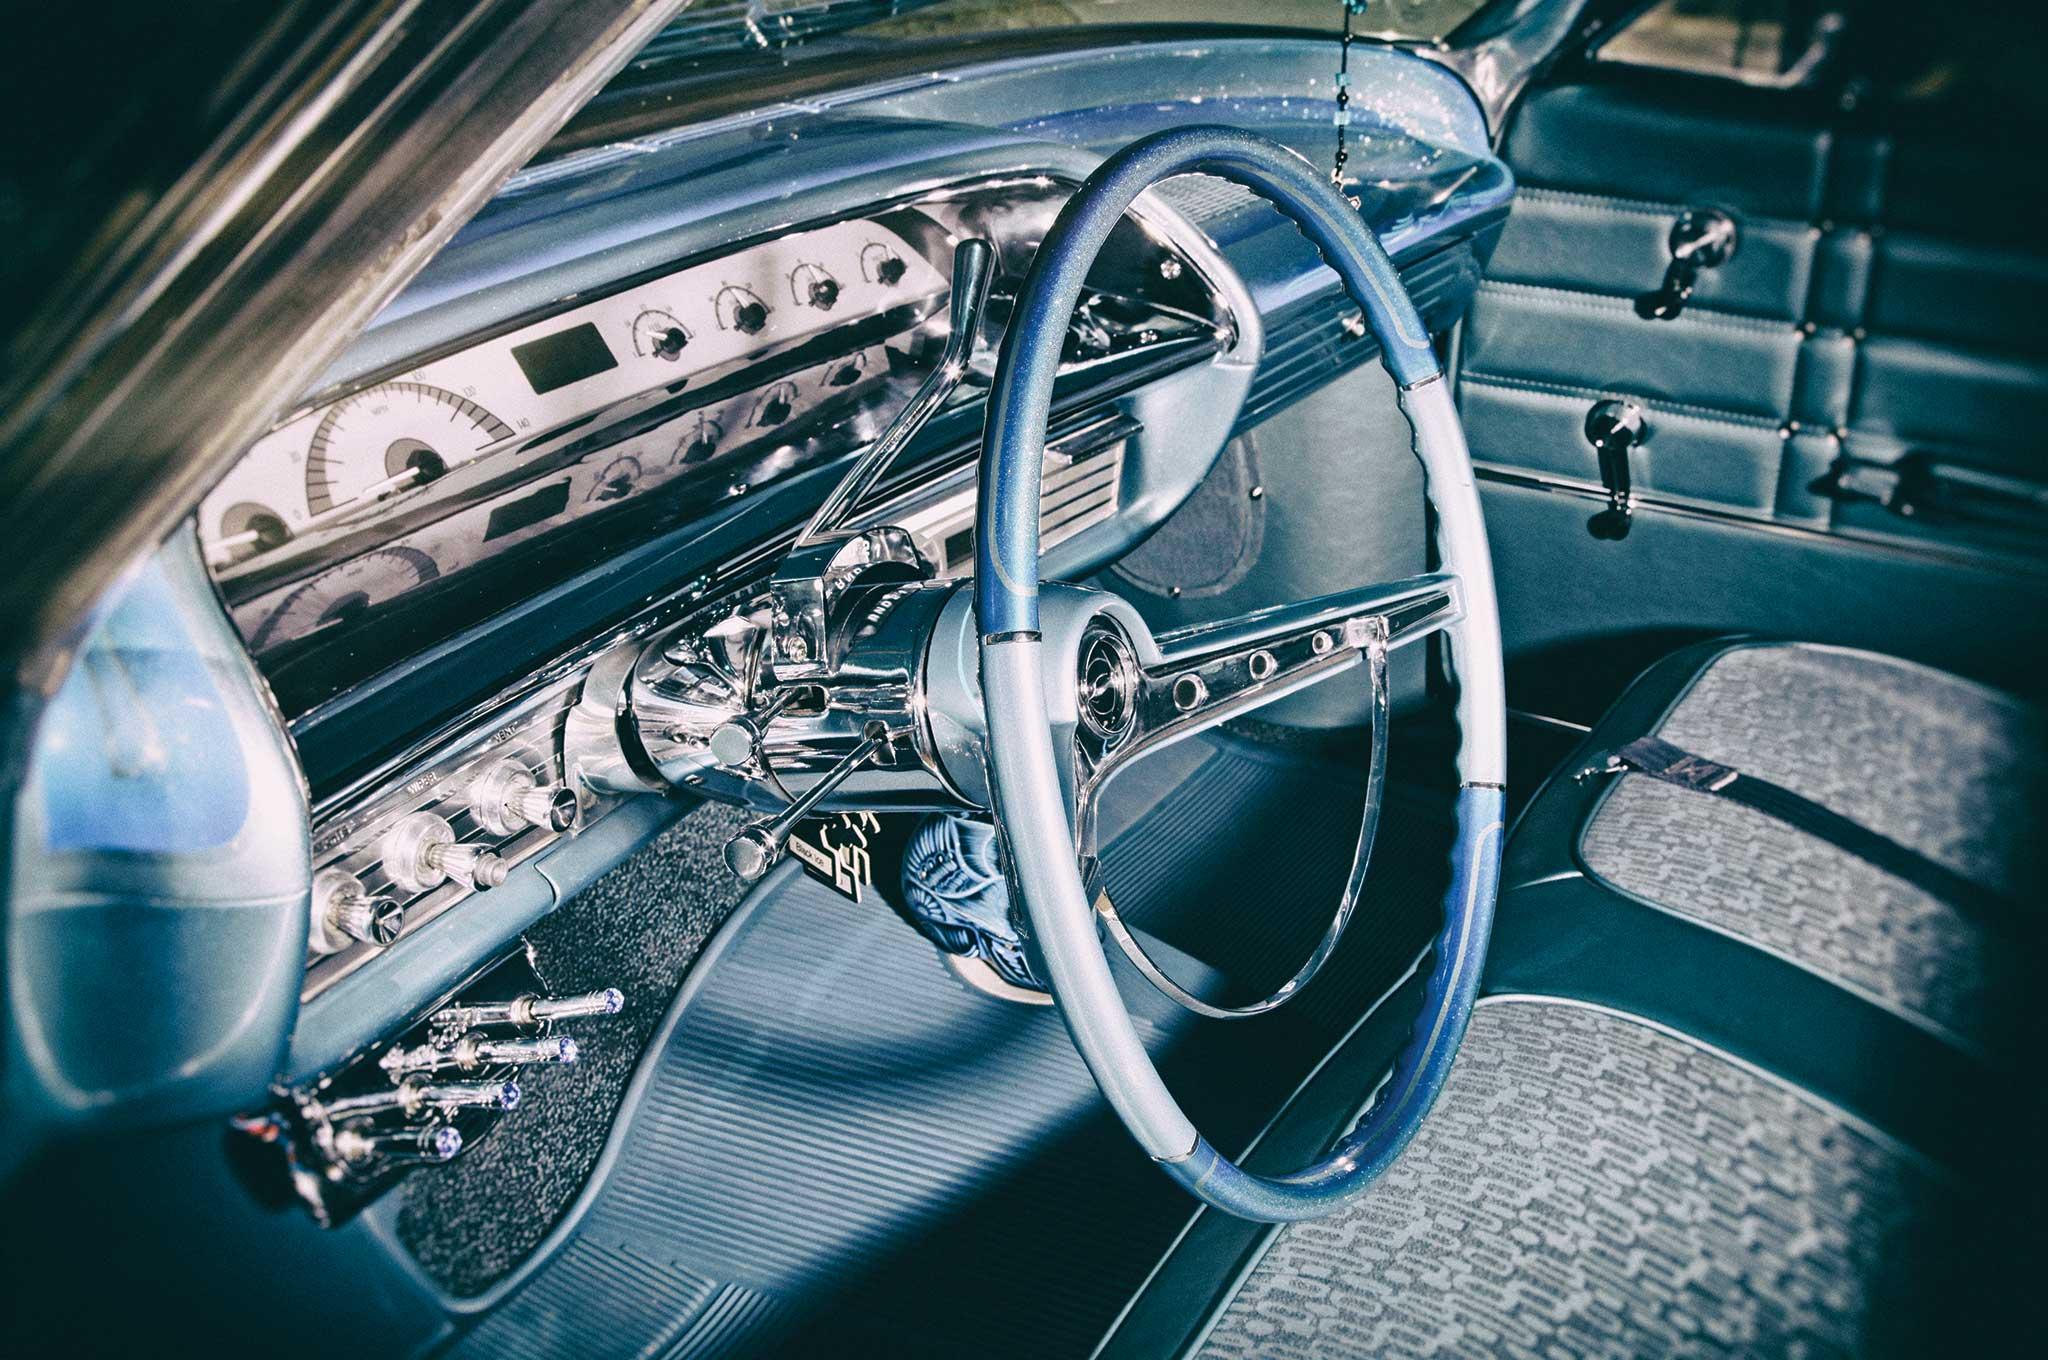 1963 Chevrolet Impala - El Six - Lowrider